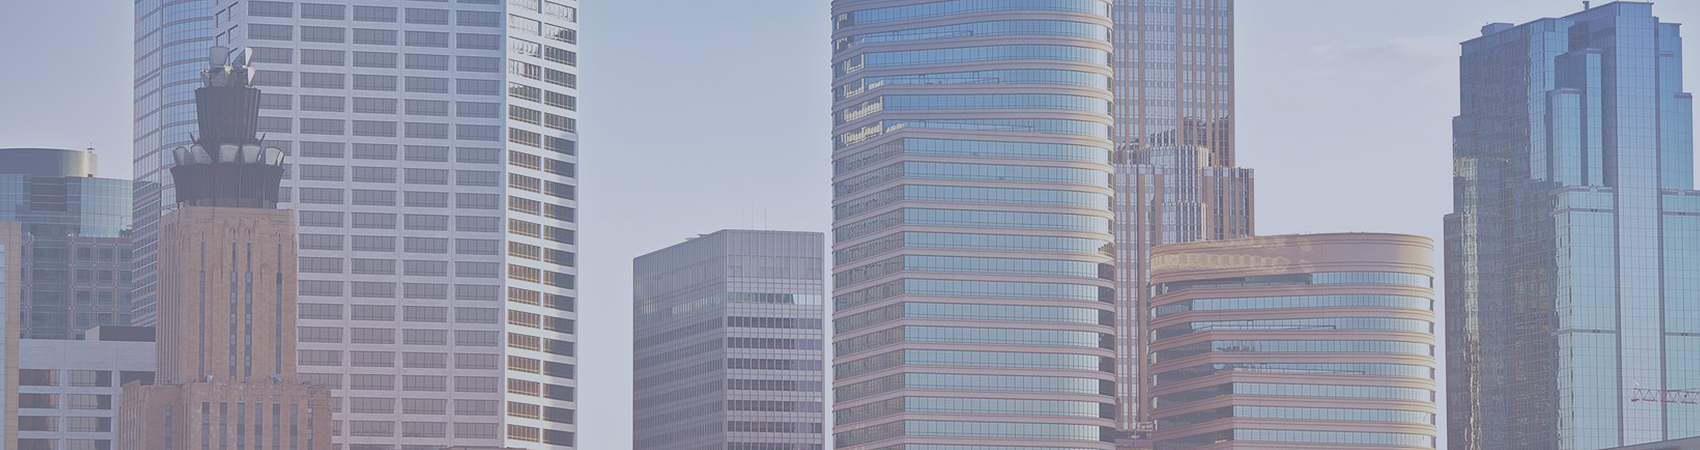 MinneapolisSkyline-flat-1